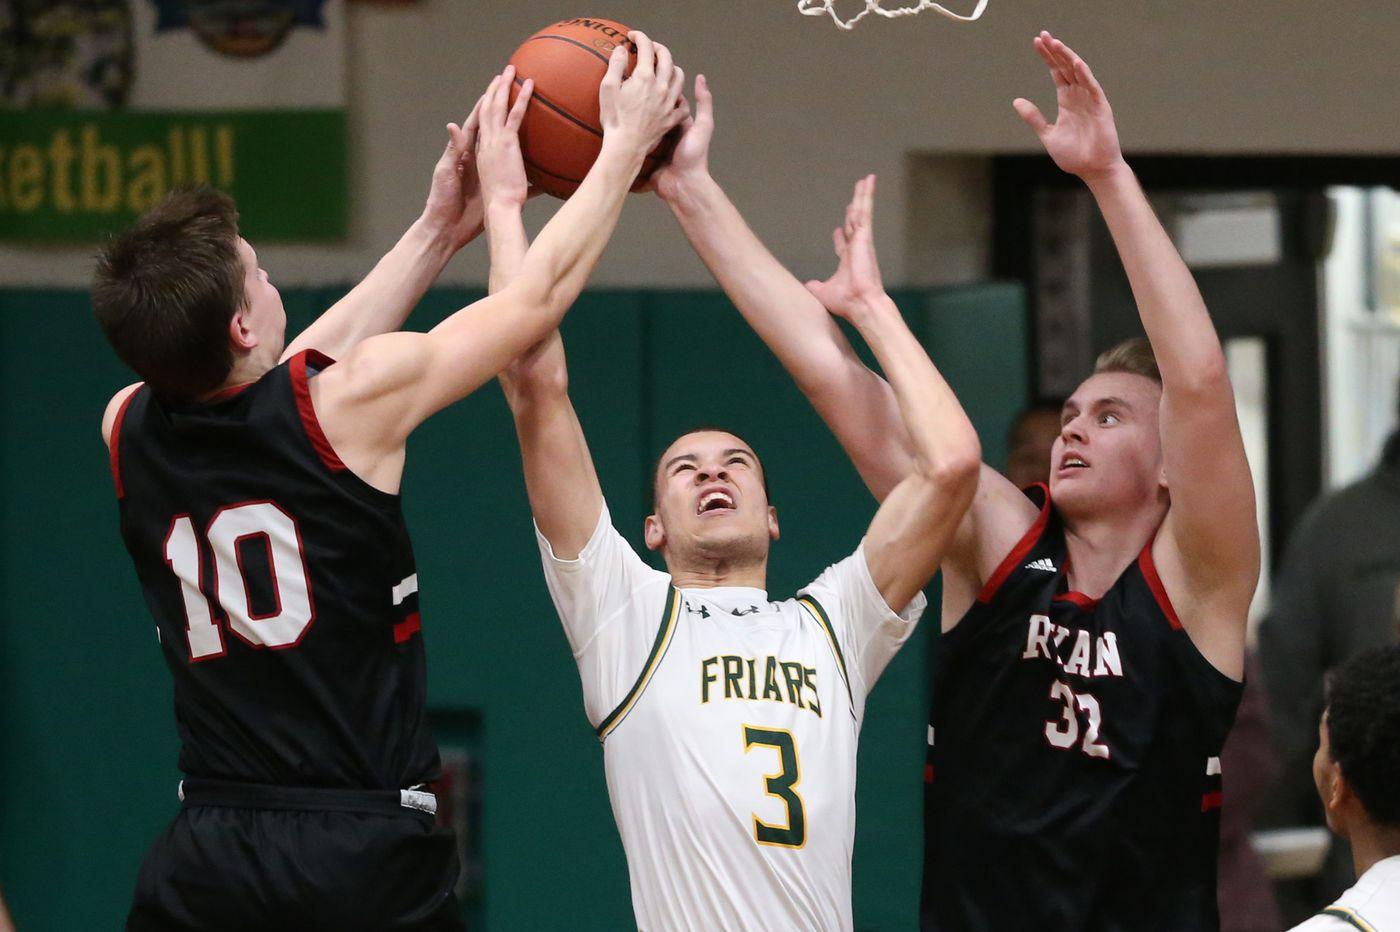 Archbishop Ryan crashes the party in the Philadelphia Catholic League boys' basketball semifinals